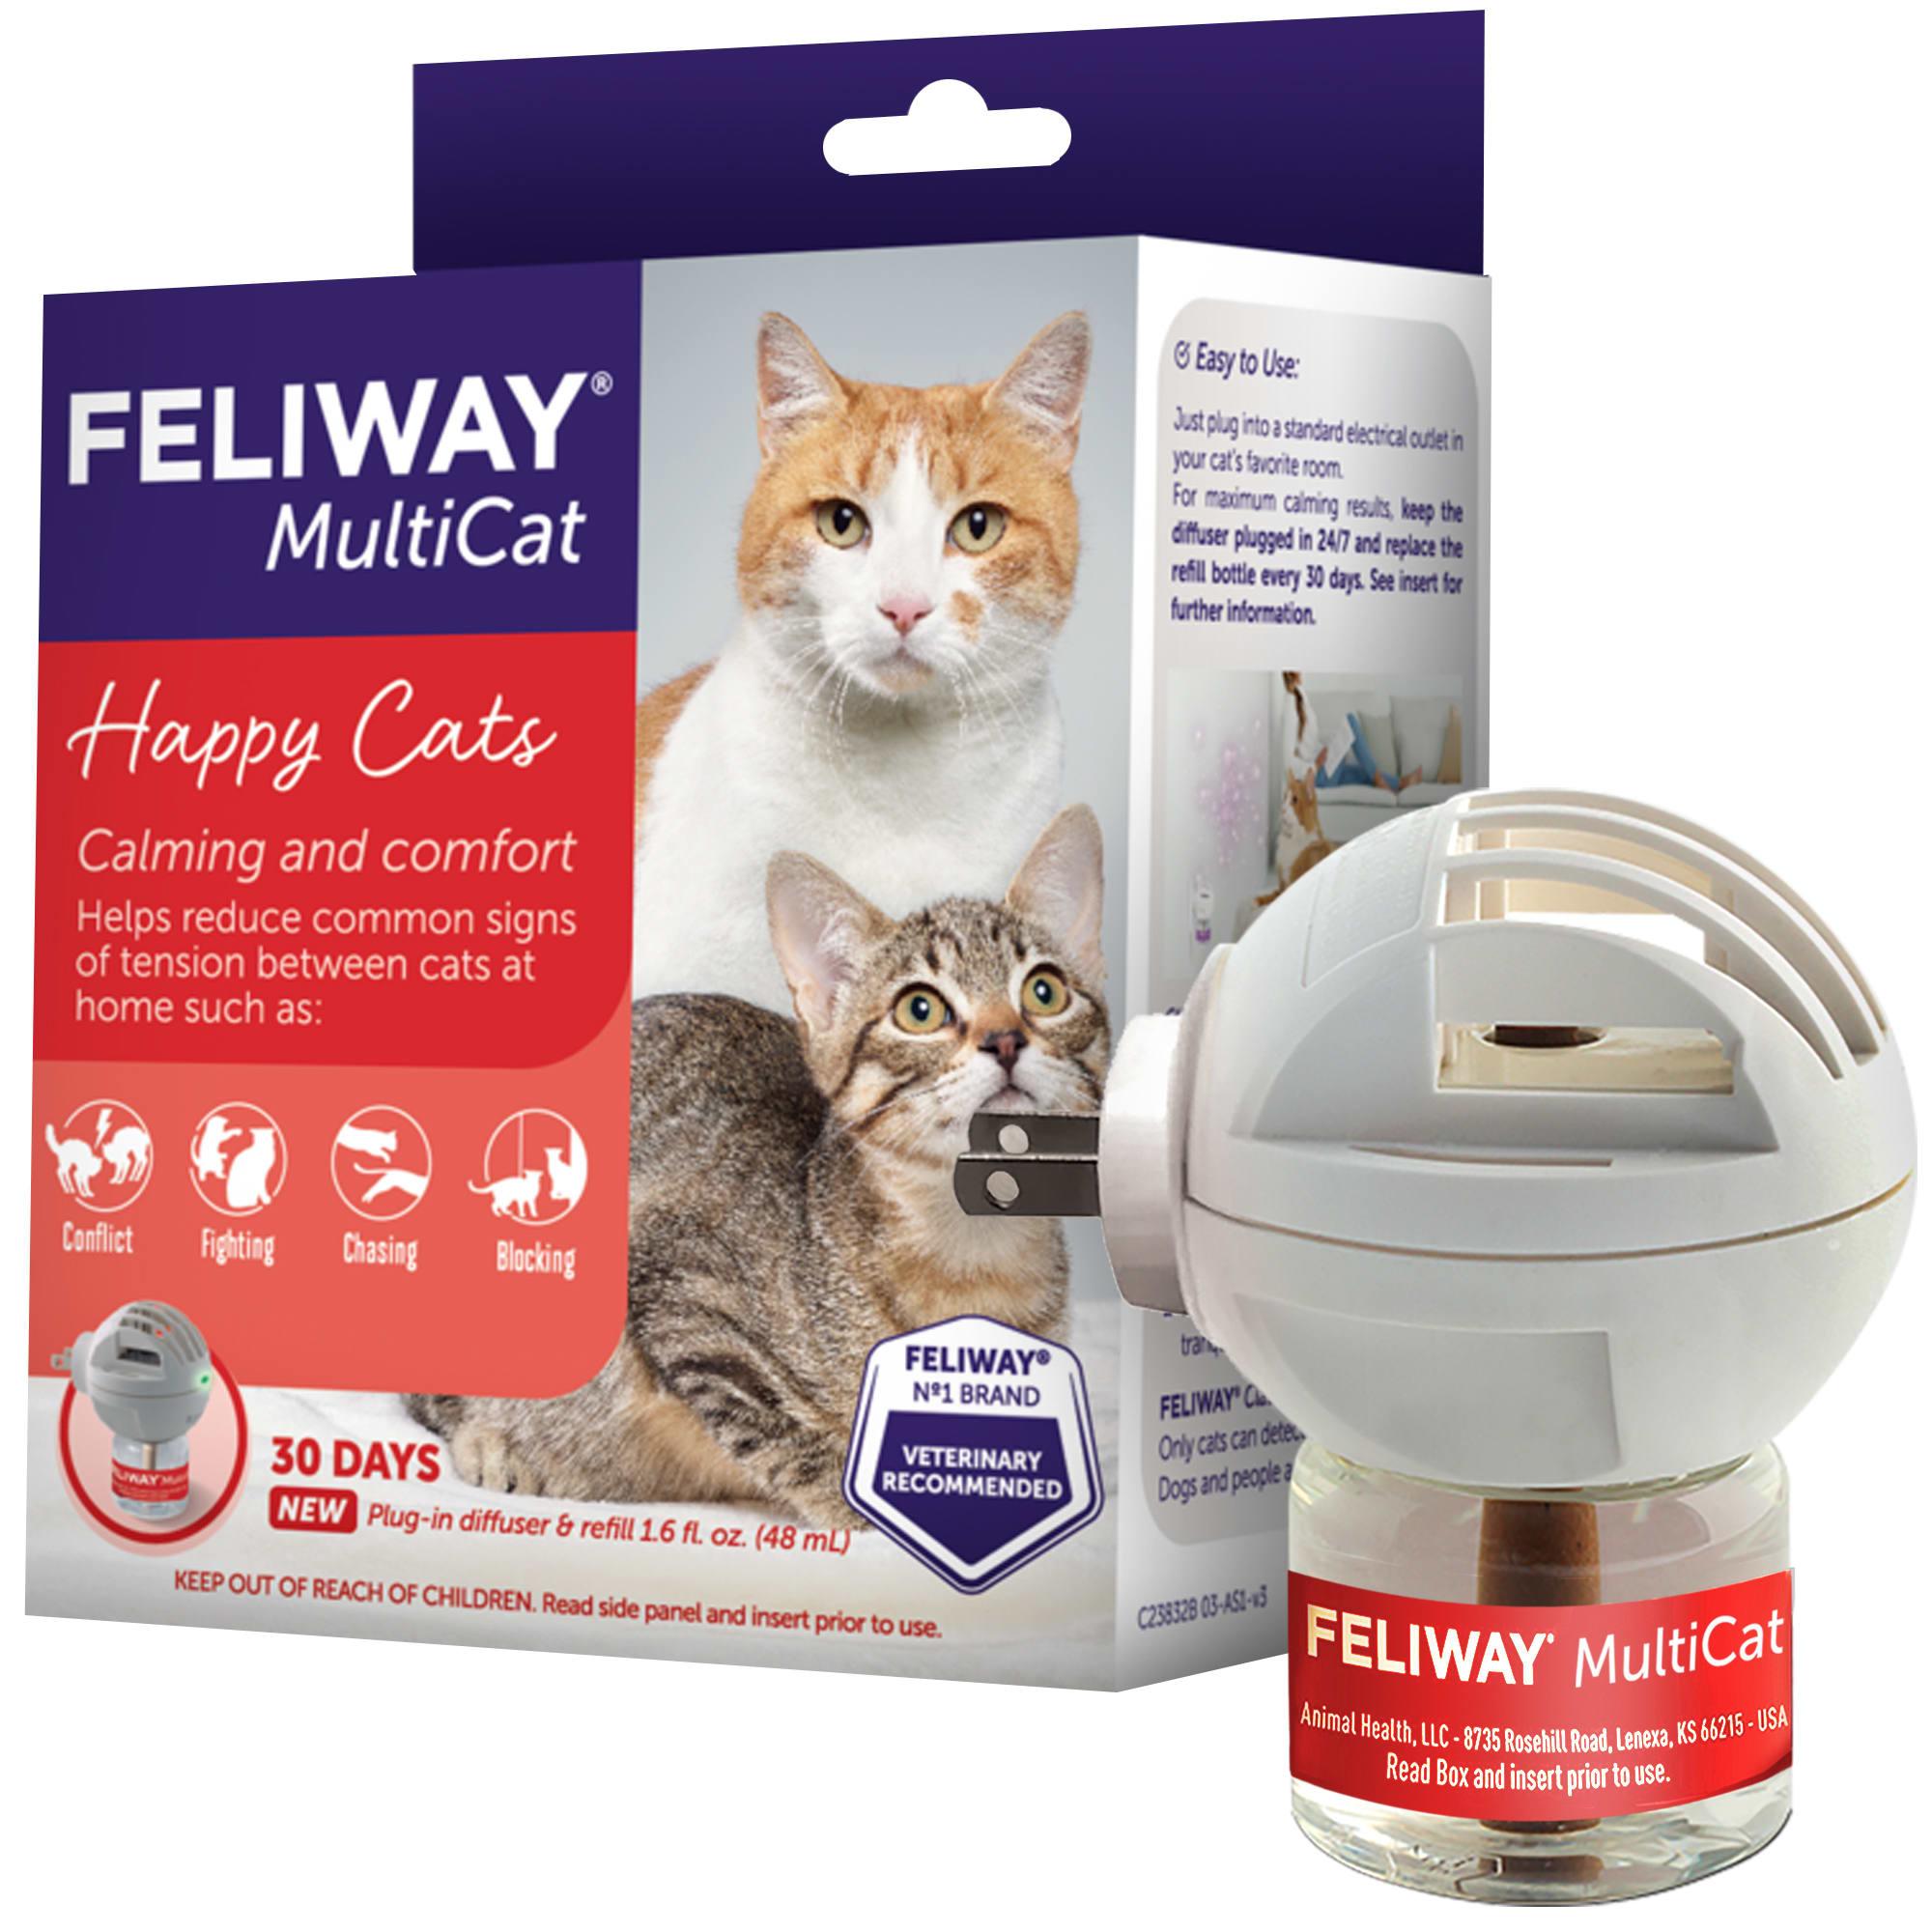 Feliway 30 Day Multicat Diffuser Plug-In Starter Kit, 48 ml. image